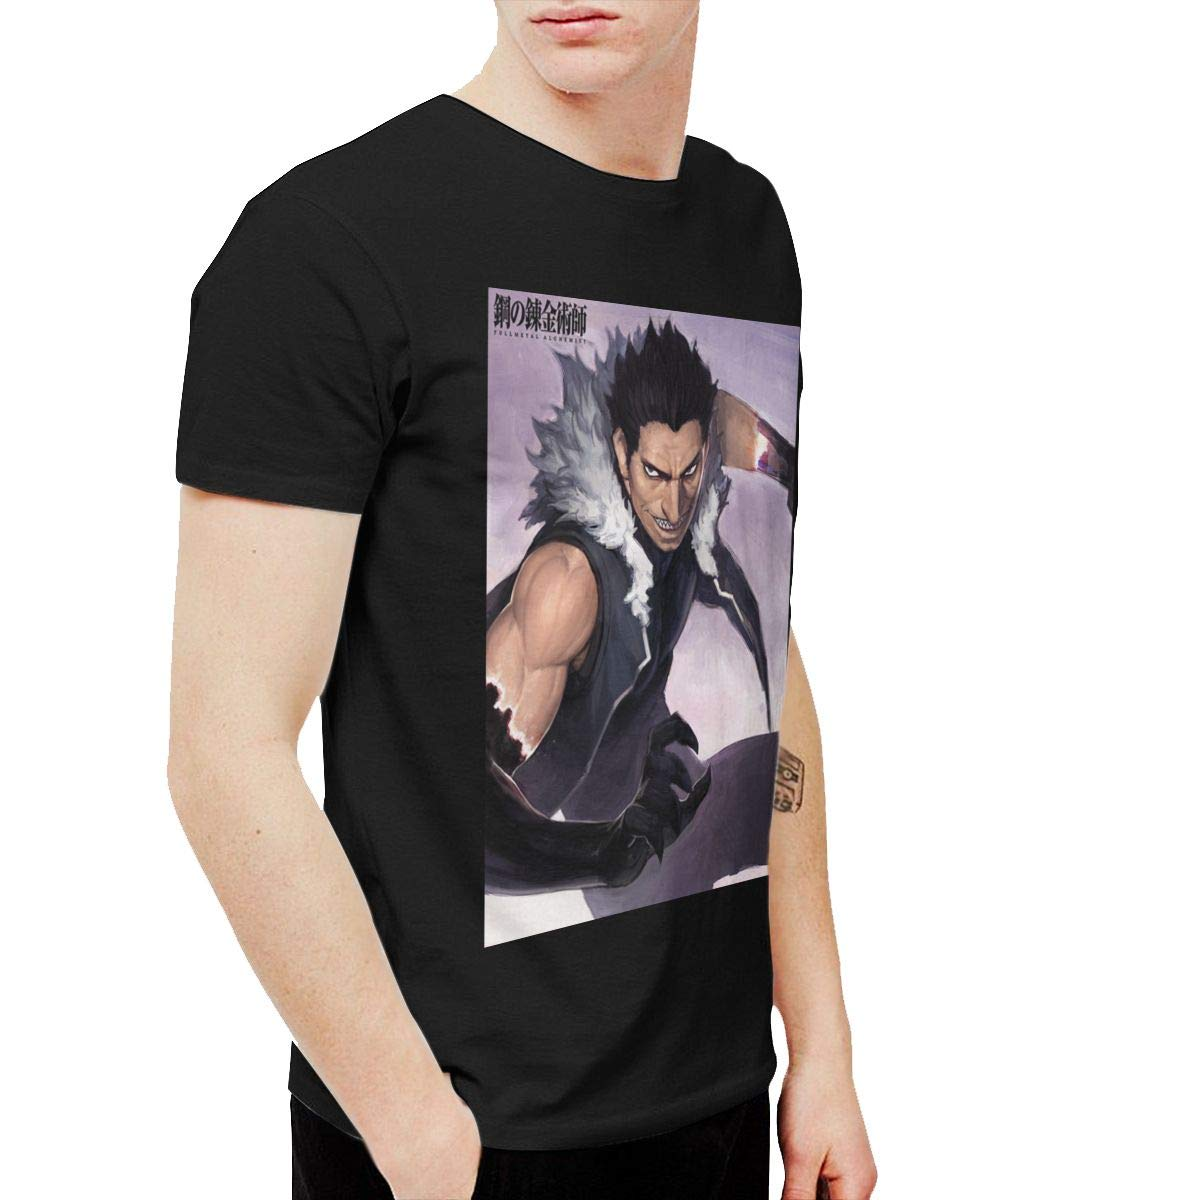 Sipdgxkkza S Fullmetal Alchemist Fashion Running Black Tshirts Short Sleeve